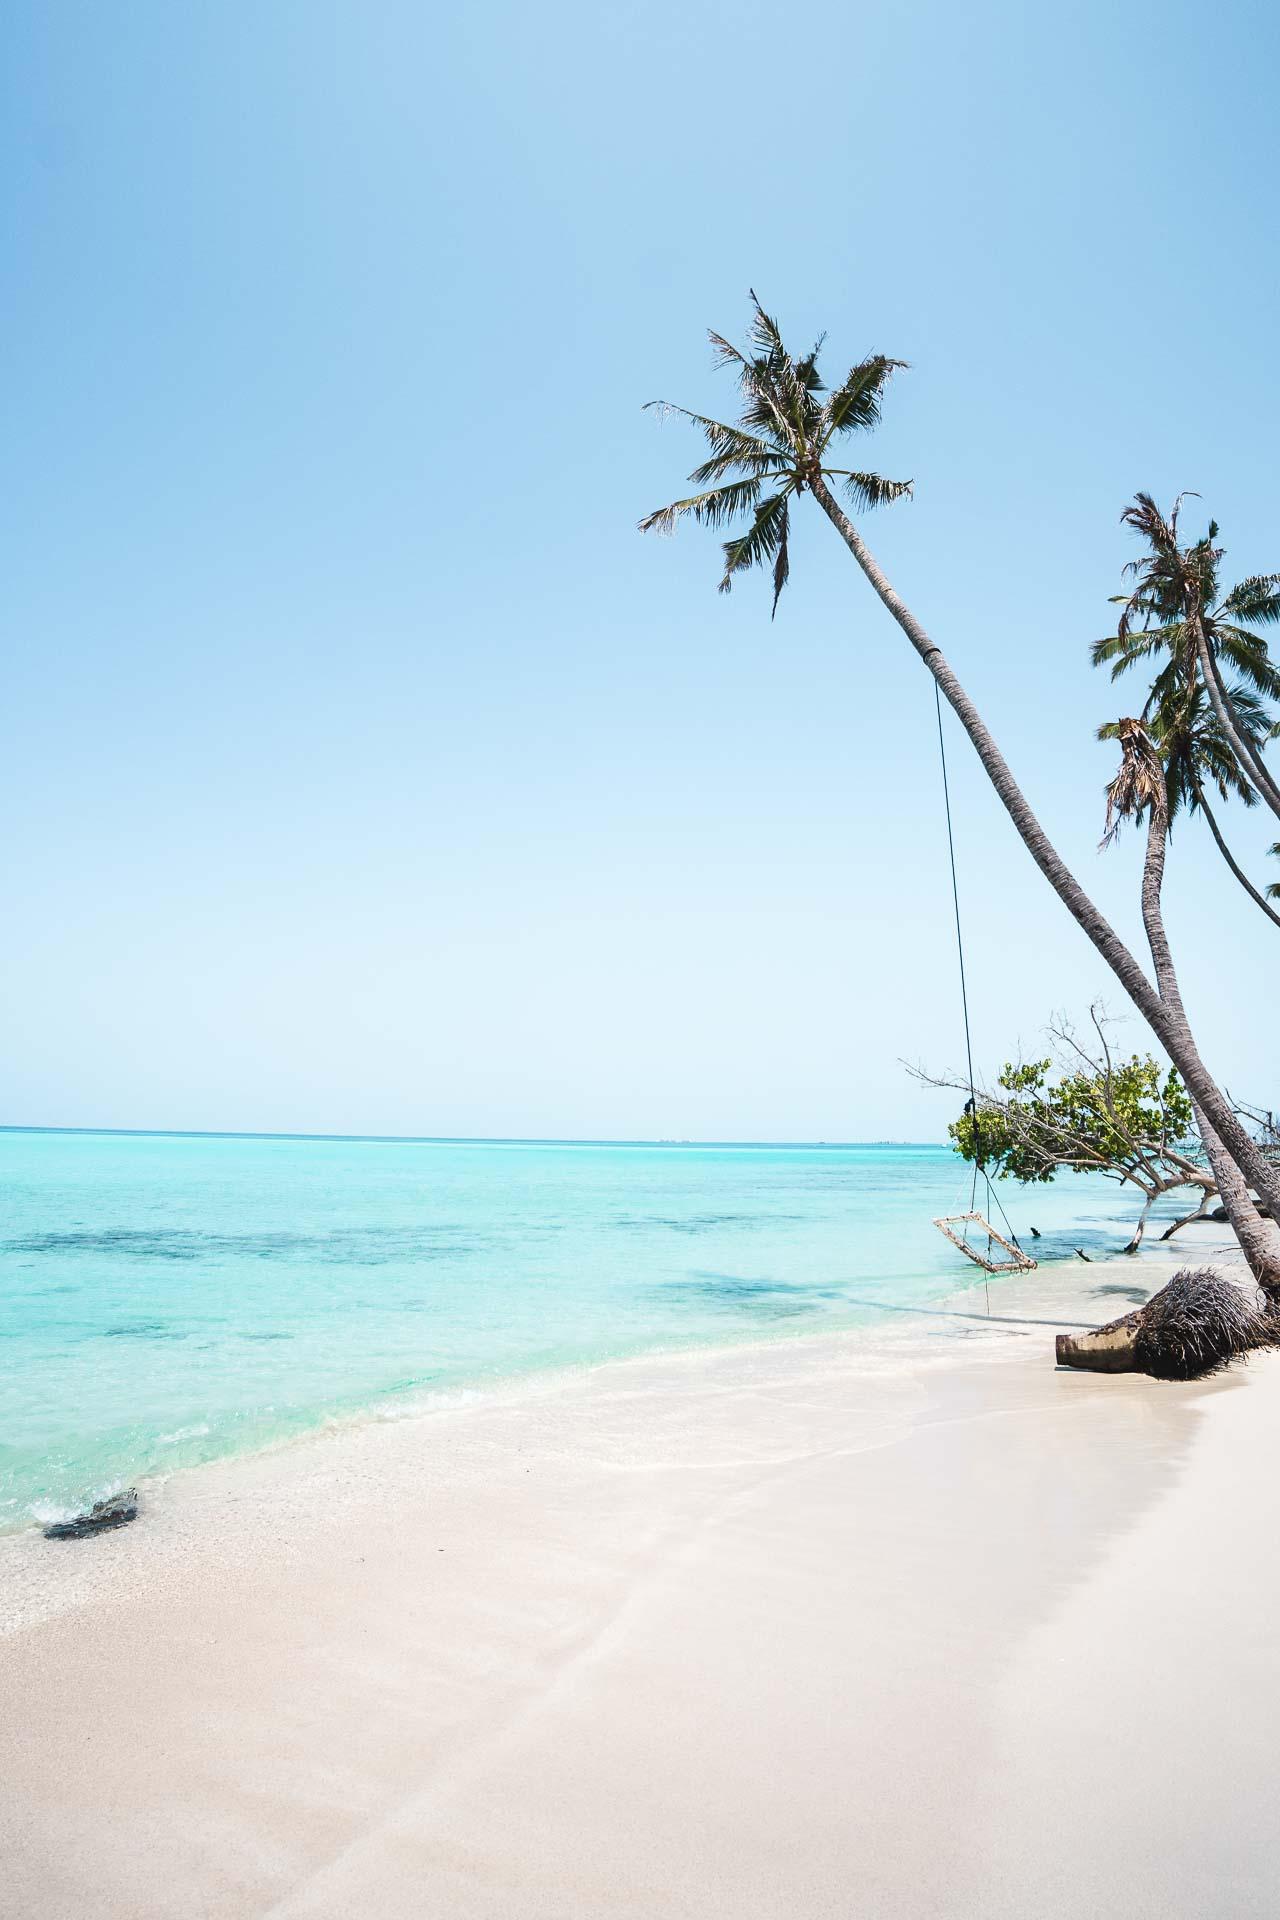 Maldives - Fulidhoo